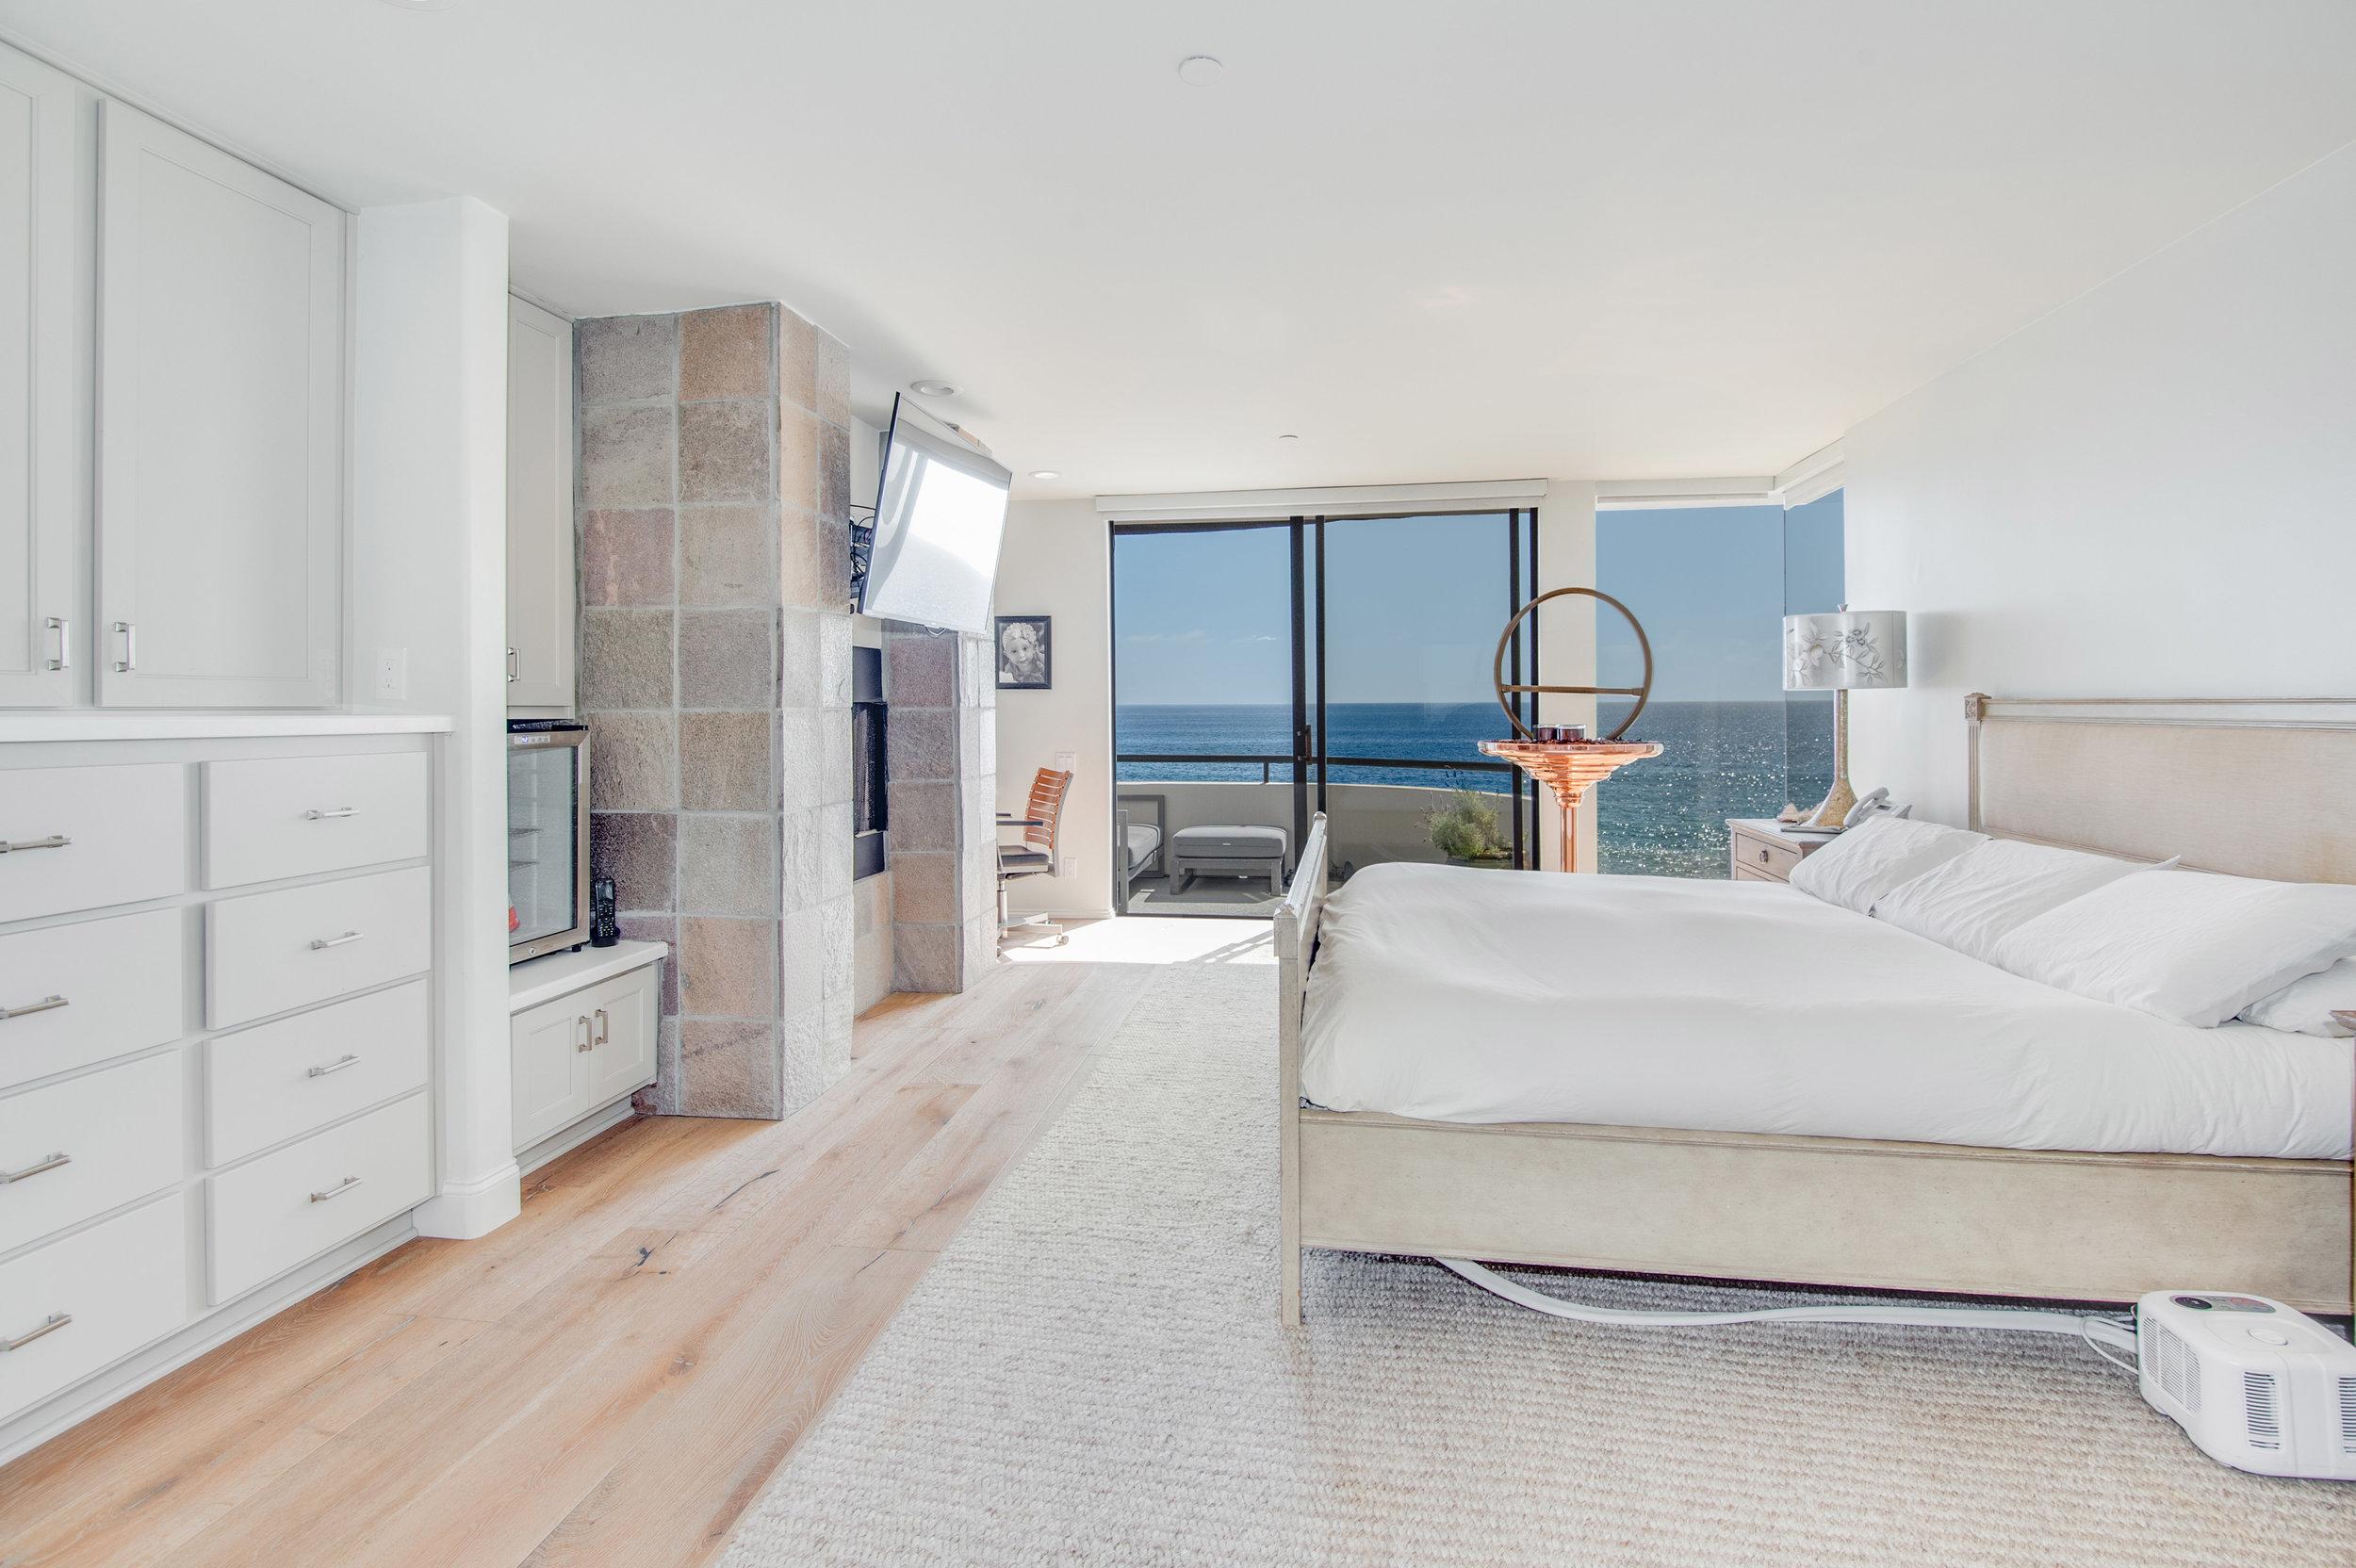 016 Master Bedroom 25252 Malibu Road For Sale Lease The Malibu Life Team Luxury Real Estate.jpg